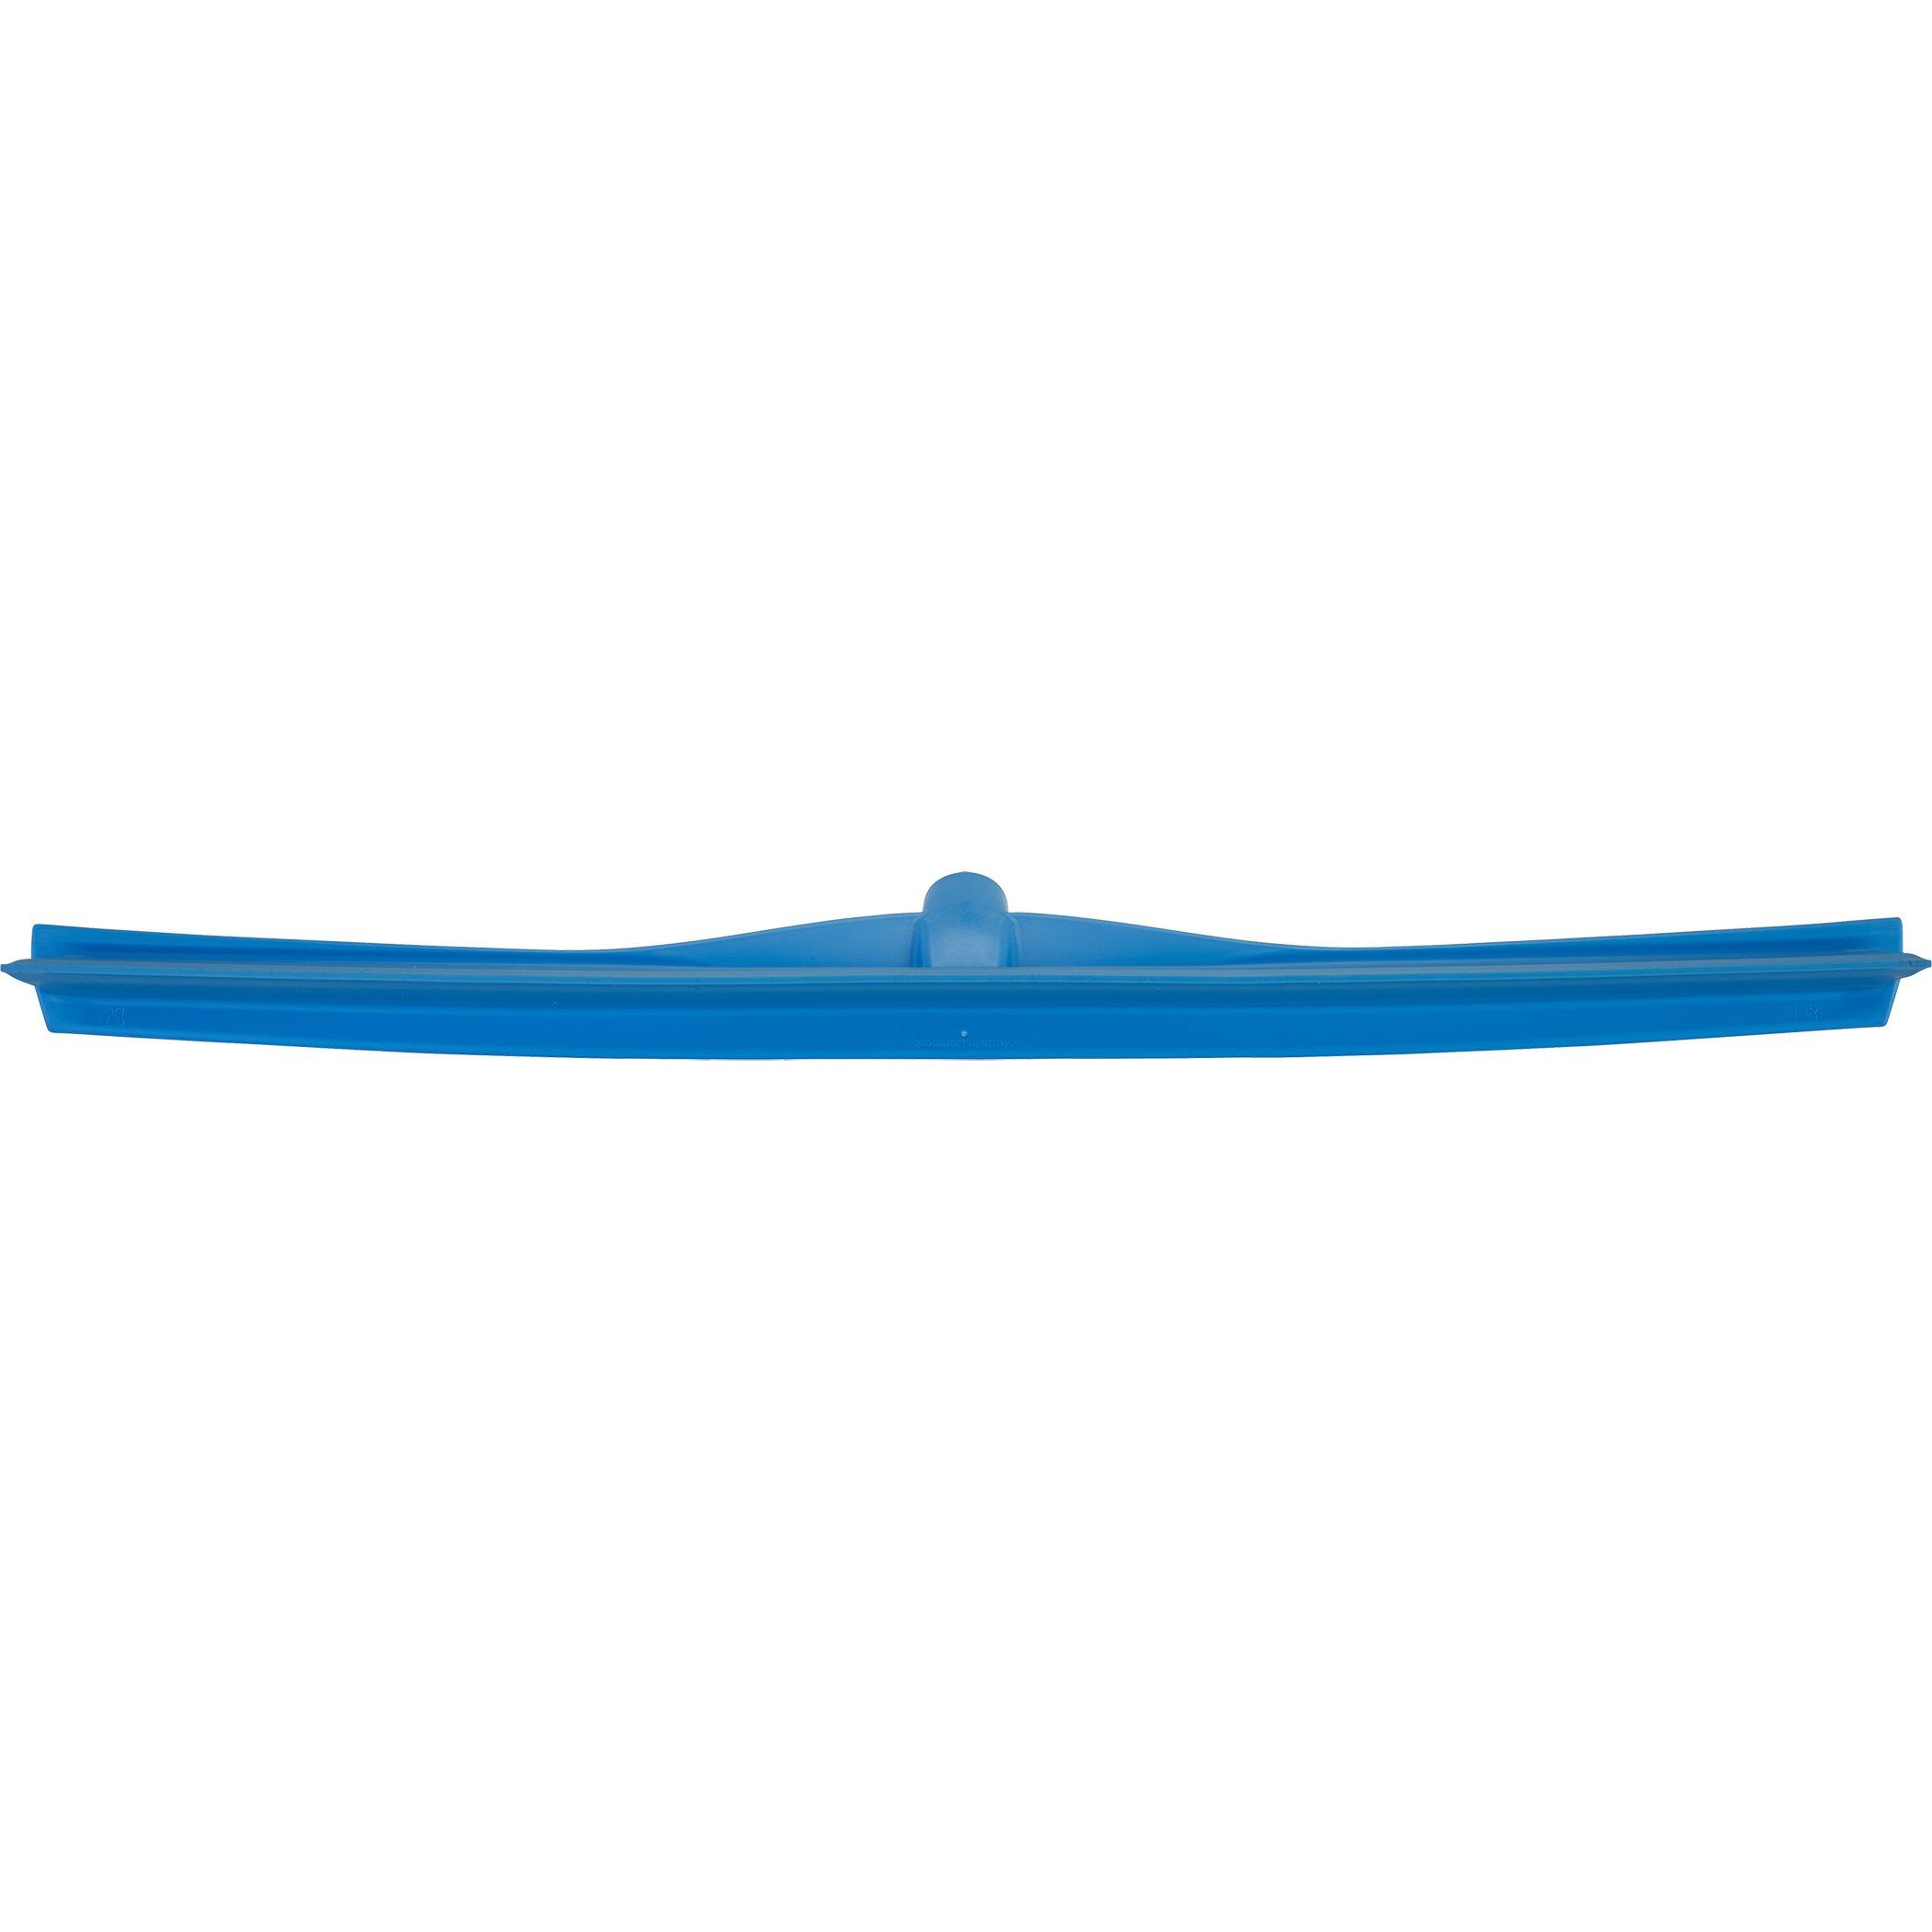 Vikan 71703 Rubber Polypropylene Frame Single Blade Squeegee, 28'', Blue